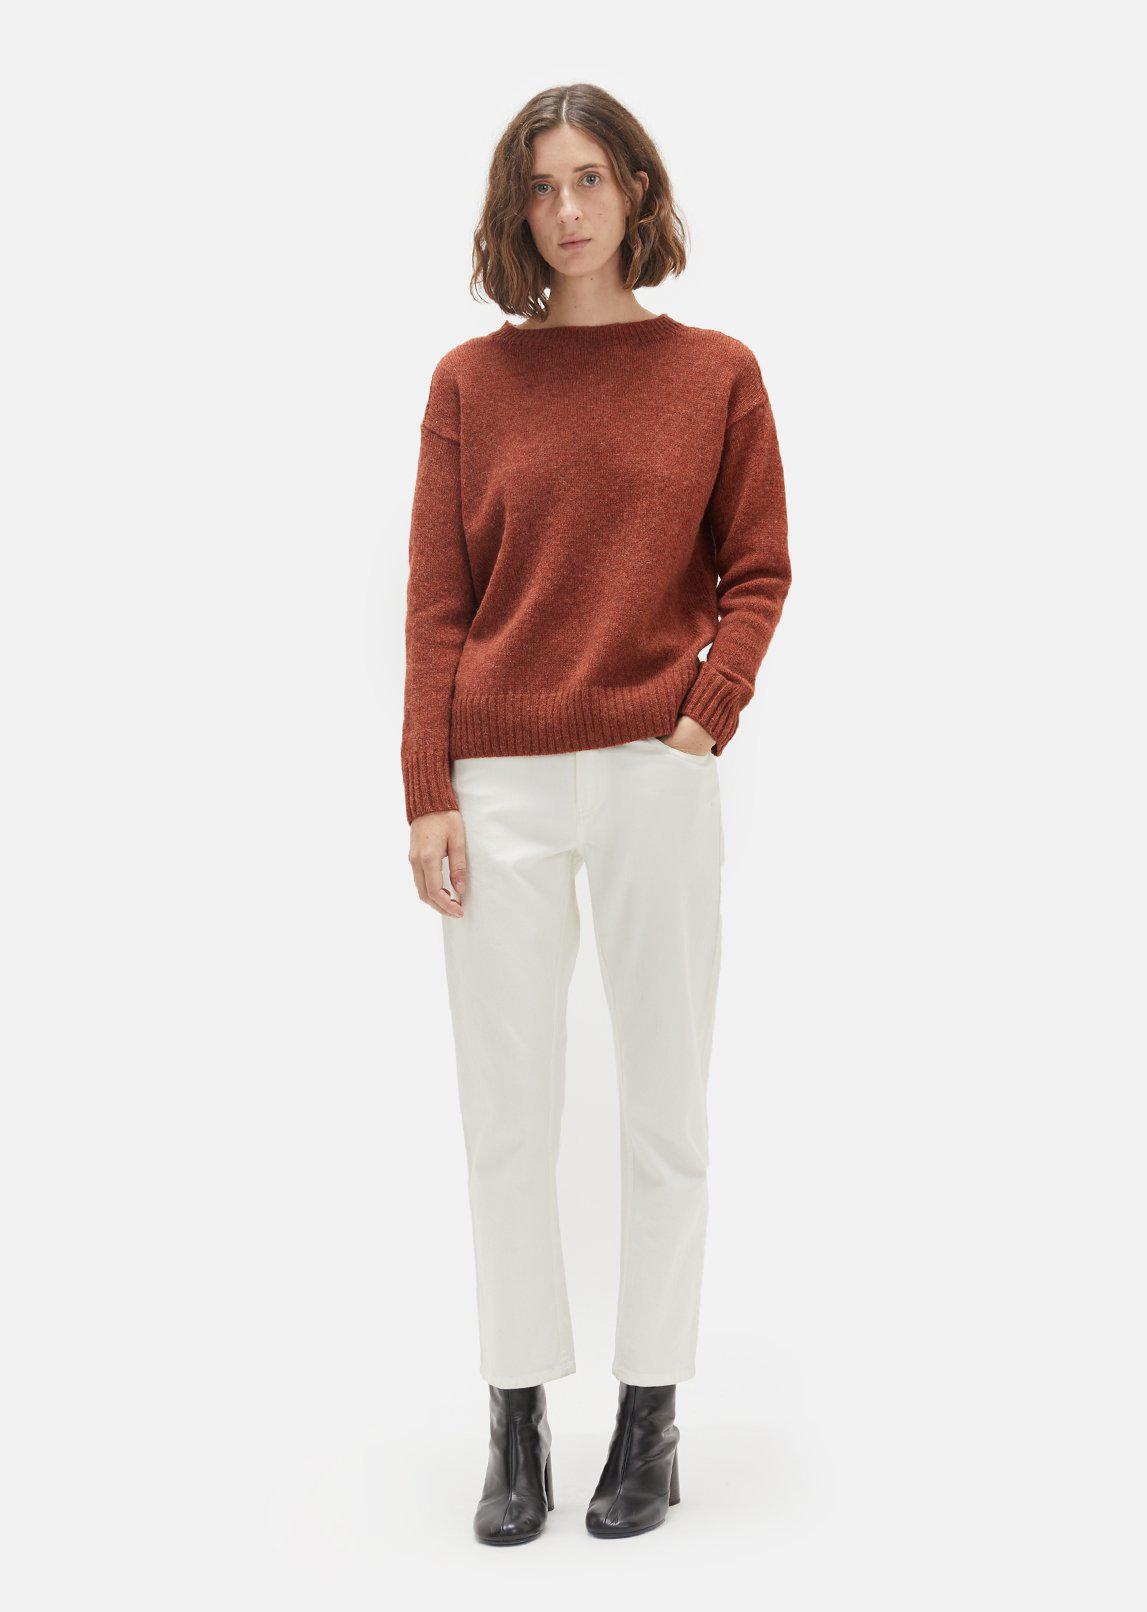 Wundervoll Moderne Pullover Foto Von View Fullscreen